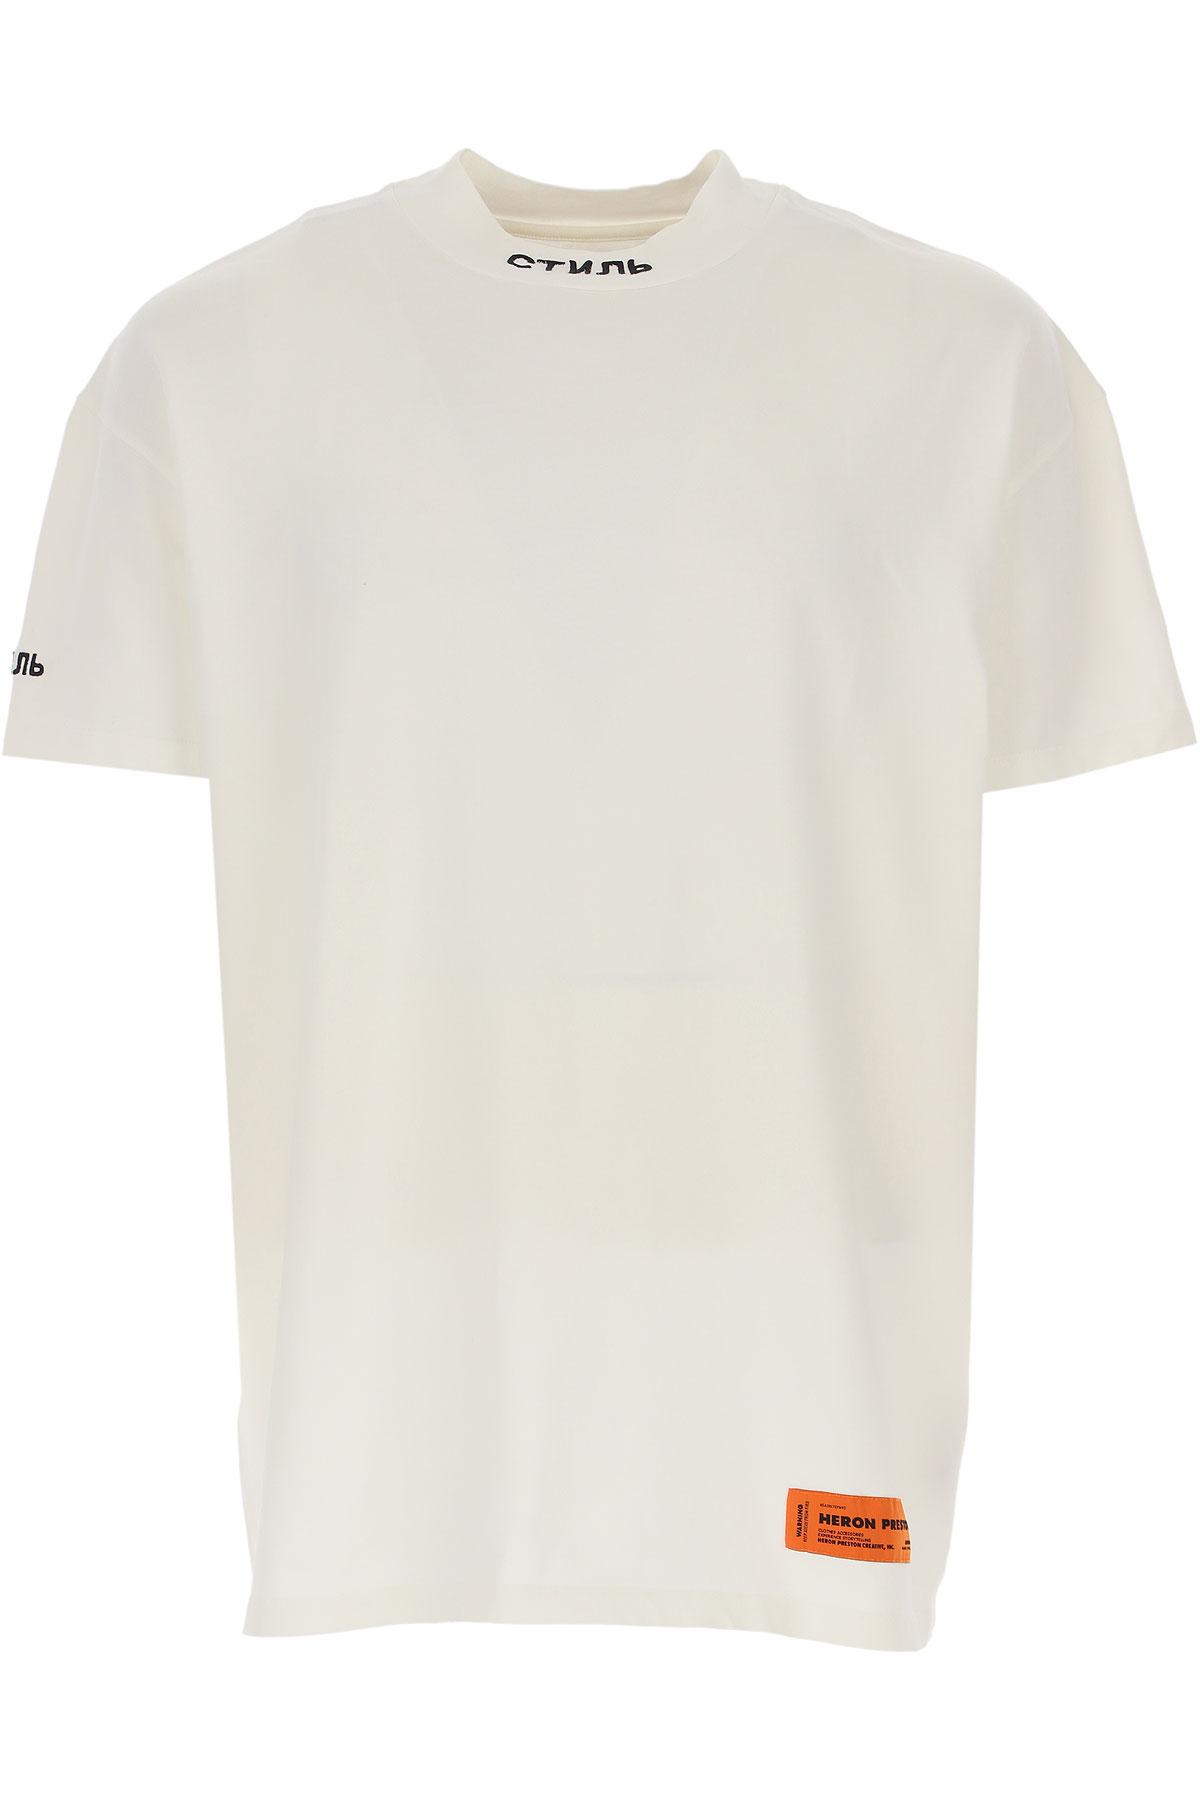 Heron Preston T-Shirt for Men, White, Cotton, 2019, L S